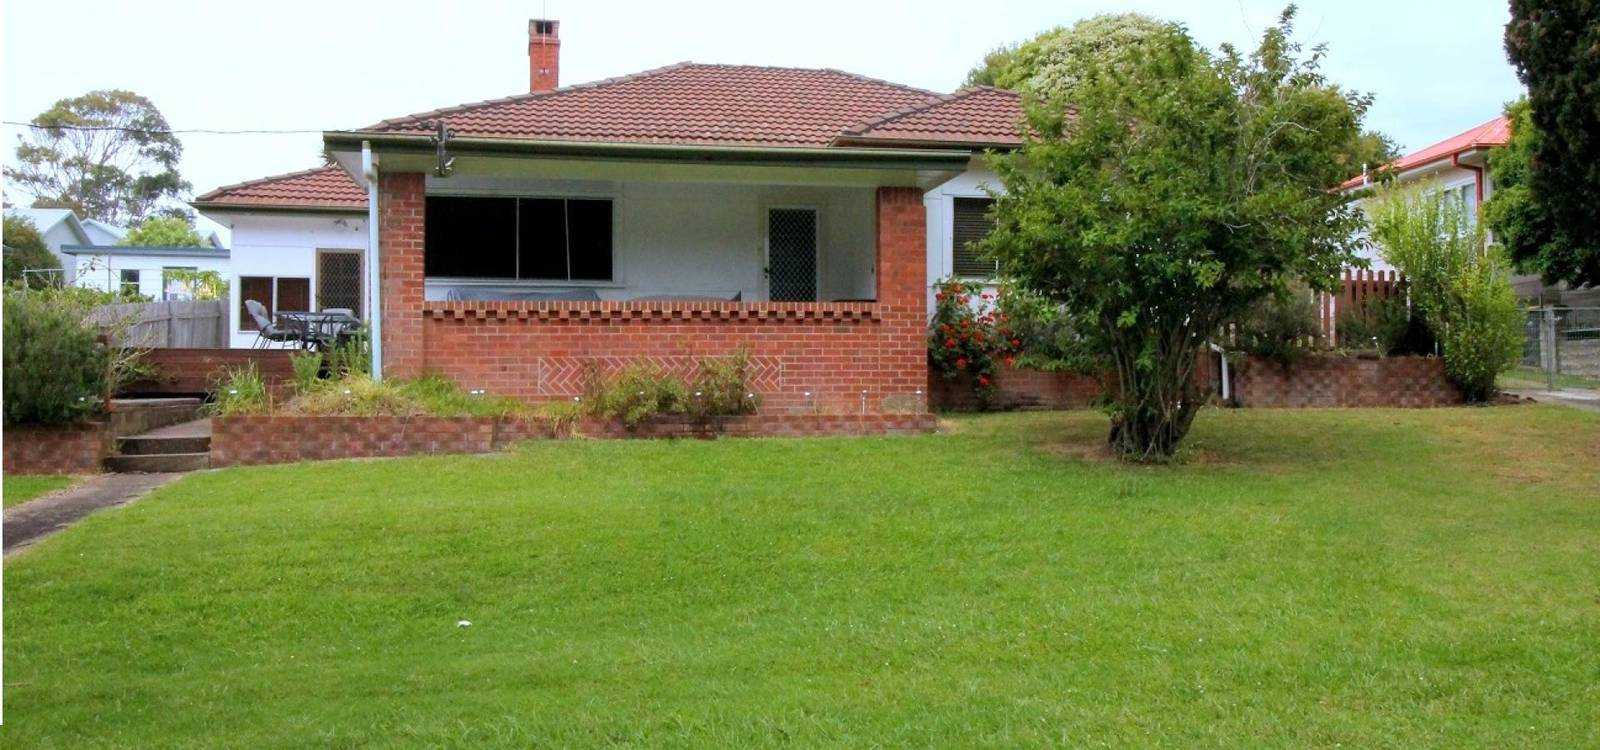 41 Jutland Avenue TUROSS HEAD, NSW 2537 - photo 1